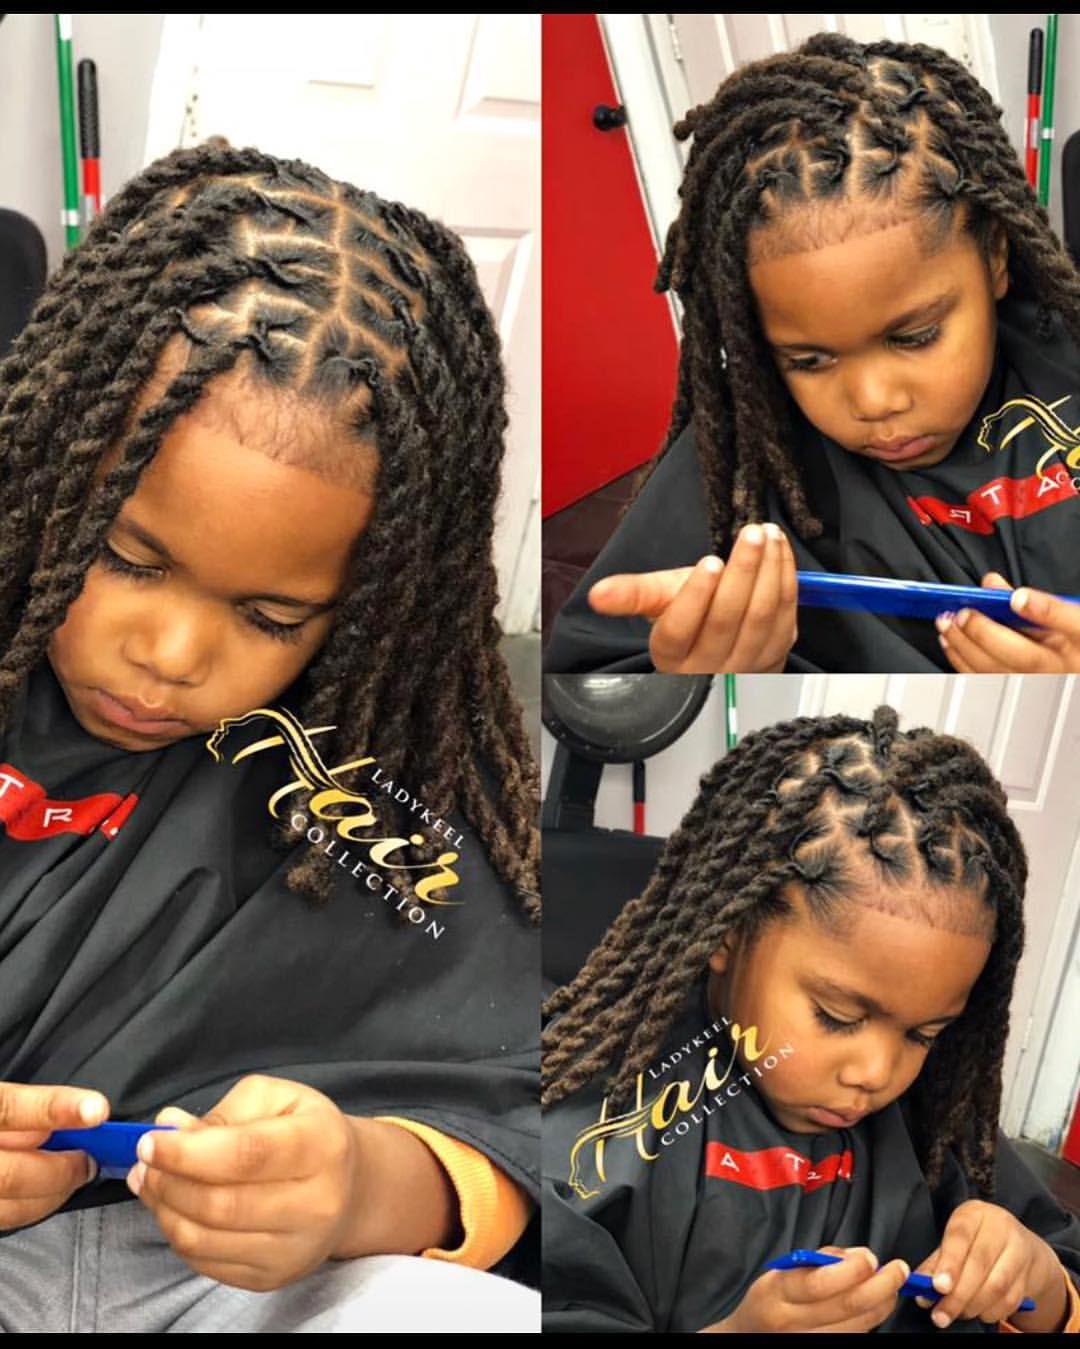 Repost Via Stylist Salon Ladykeelslayhair Nov 16 2018 At 12 07pm Ut In 2020 Kids Hairstyles Kids Braided Hairstyles Braids For Boys